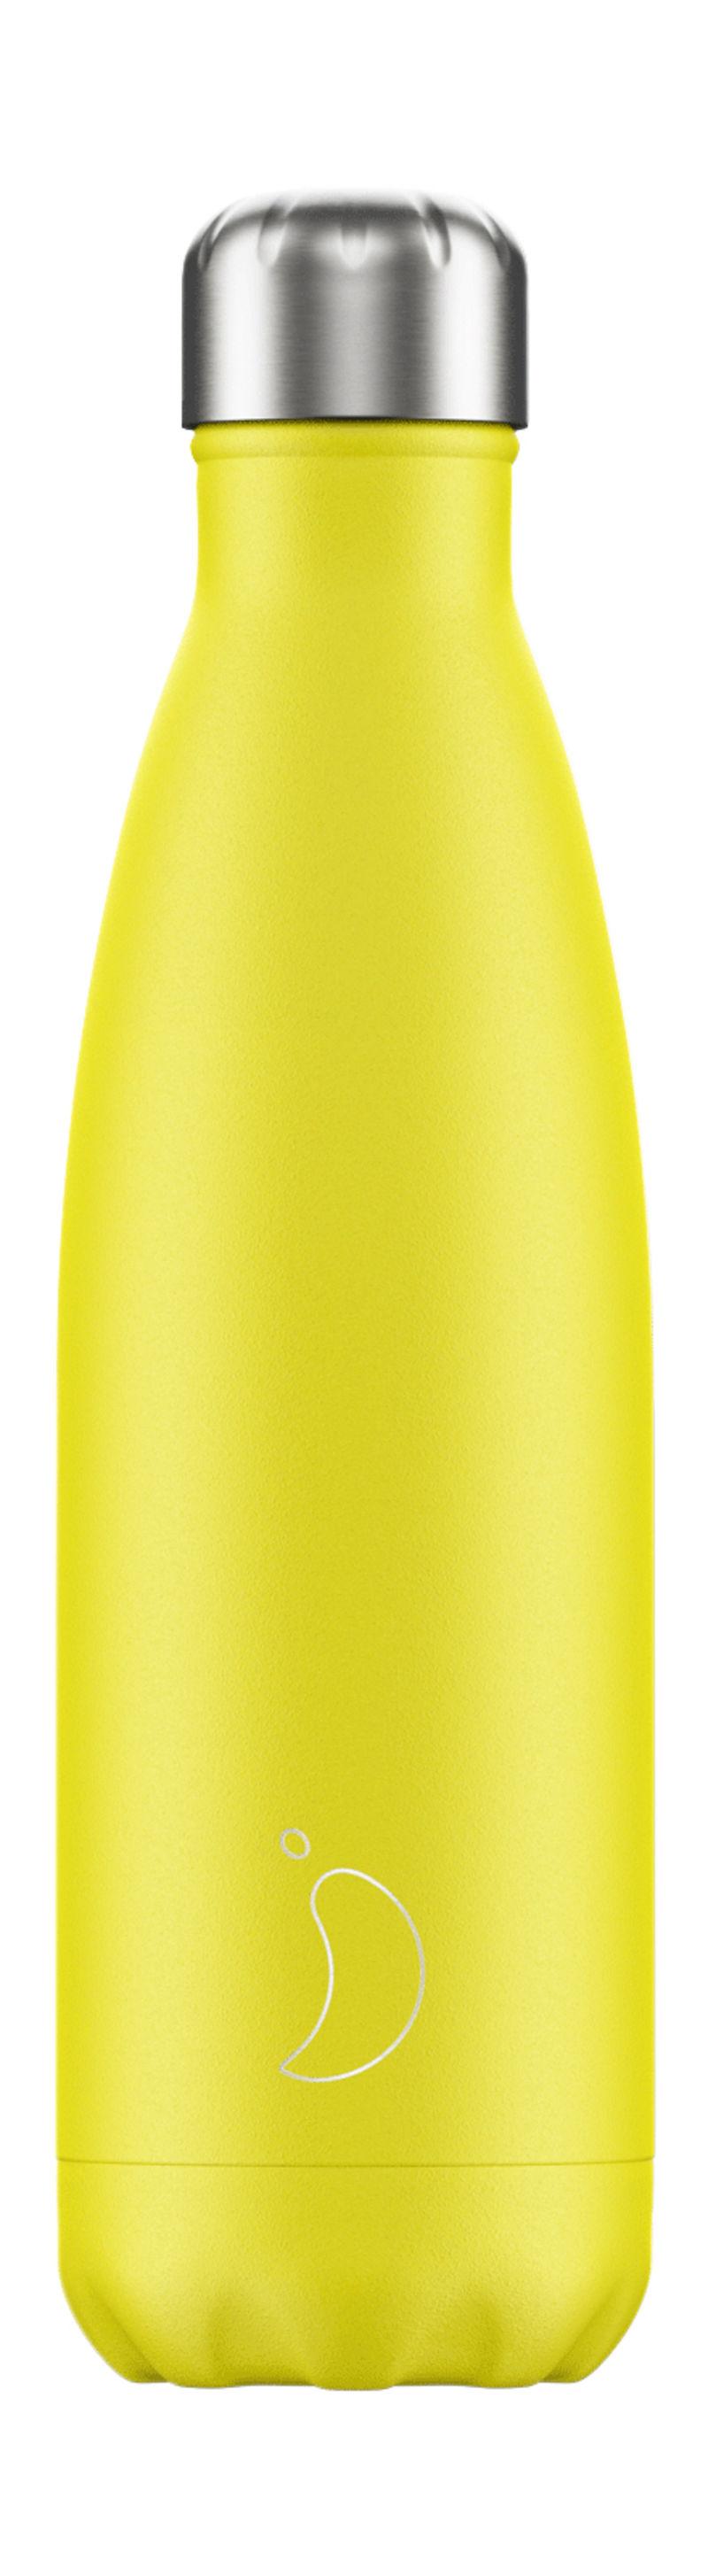 Botella Inox Amarillo Neon 500ml -